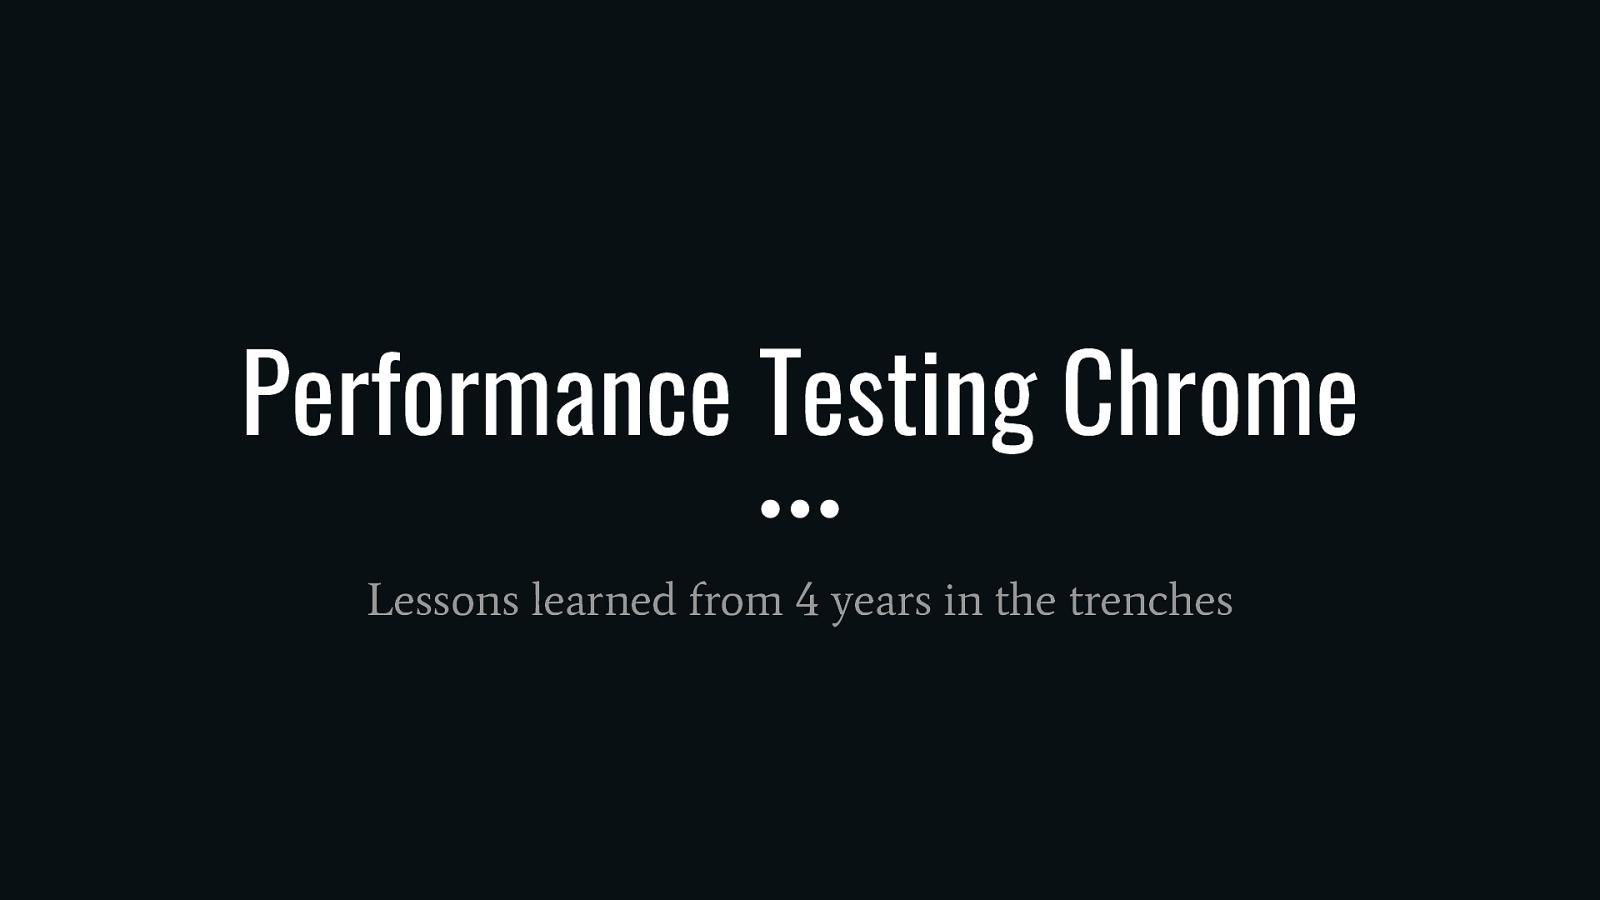 Performance Testing Chrome